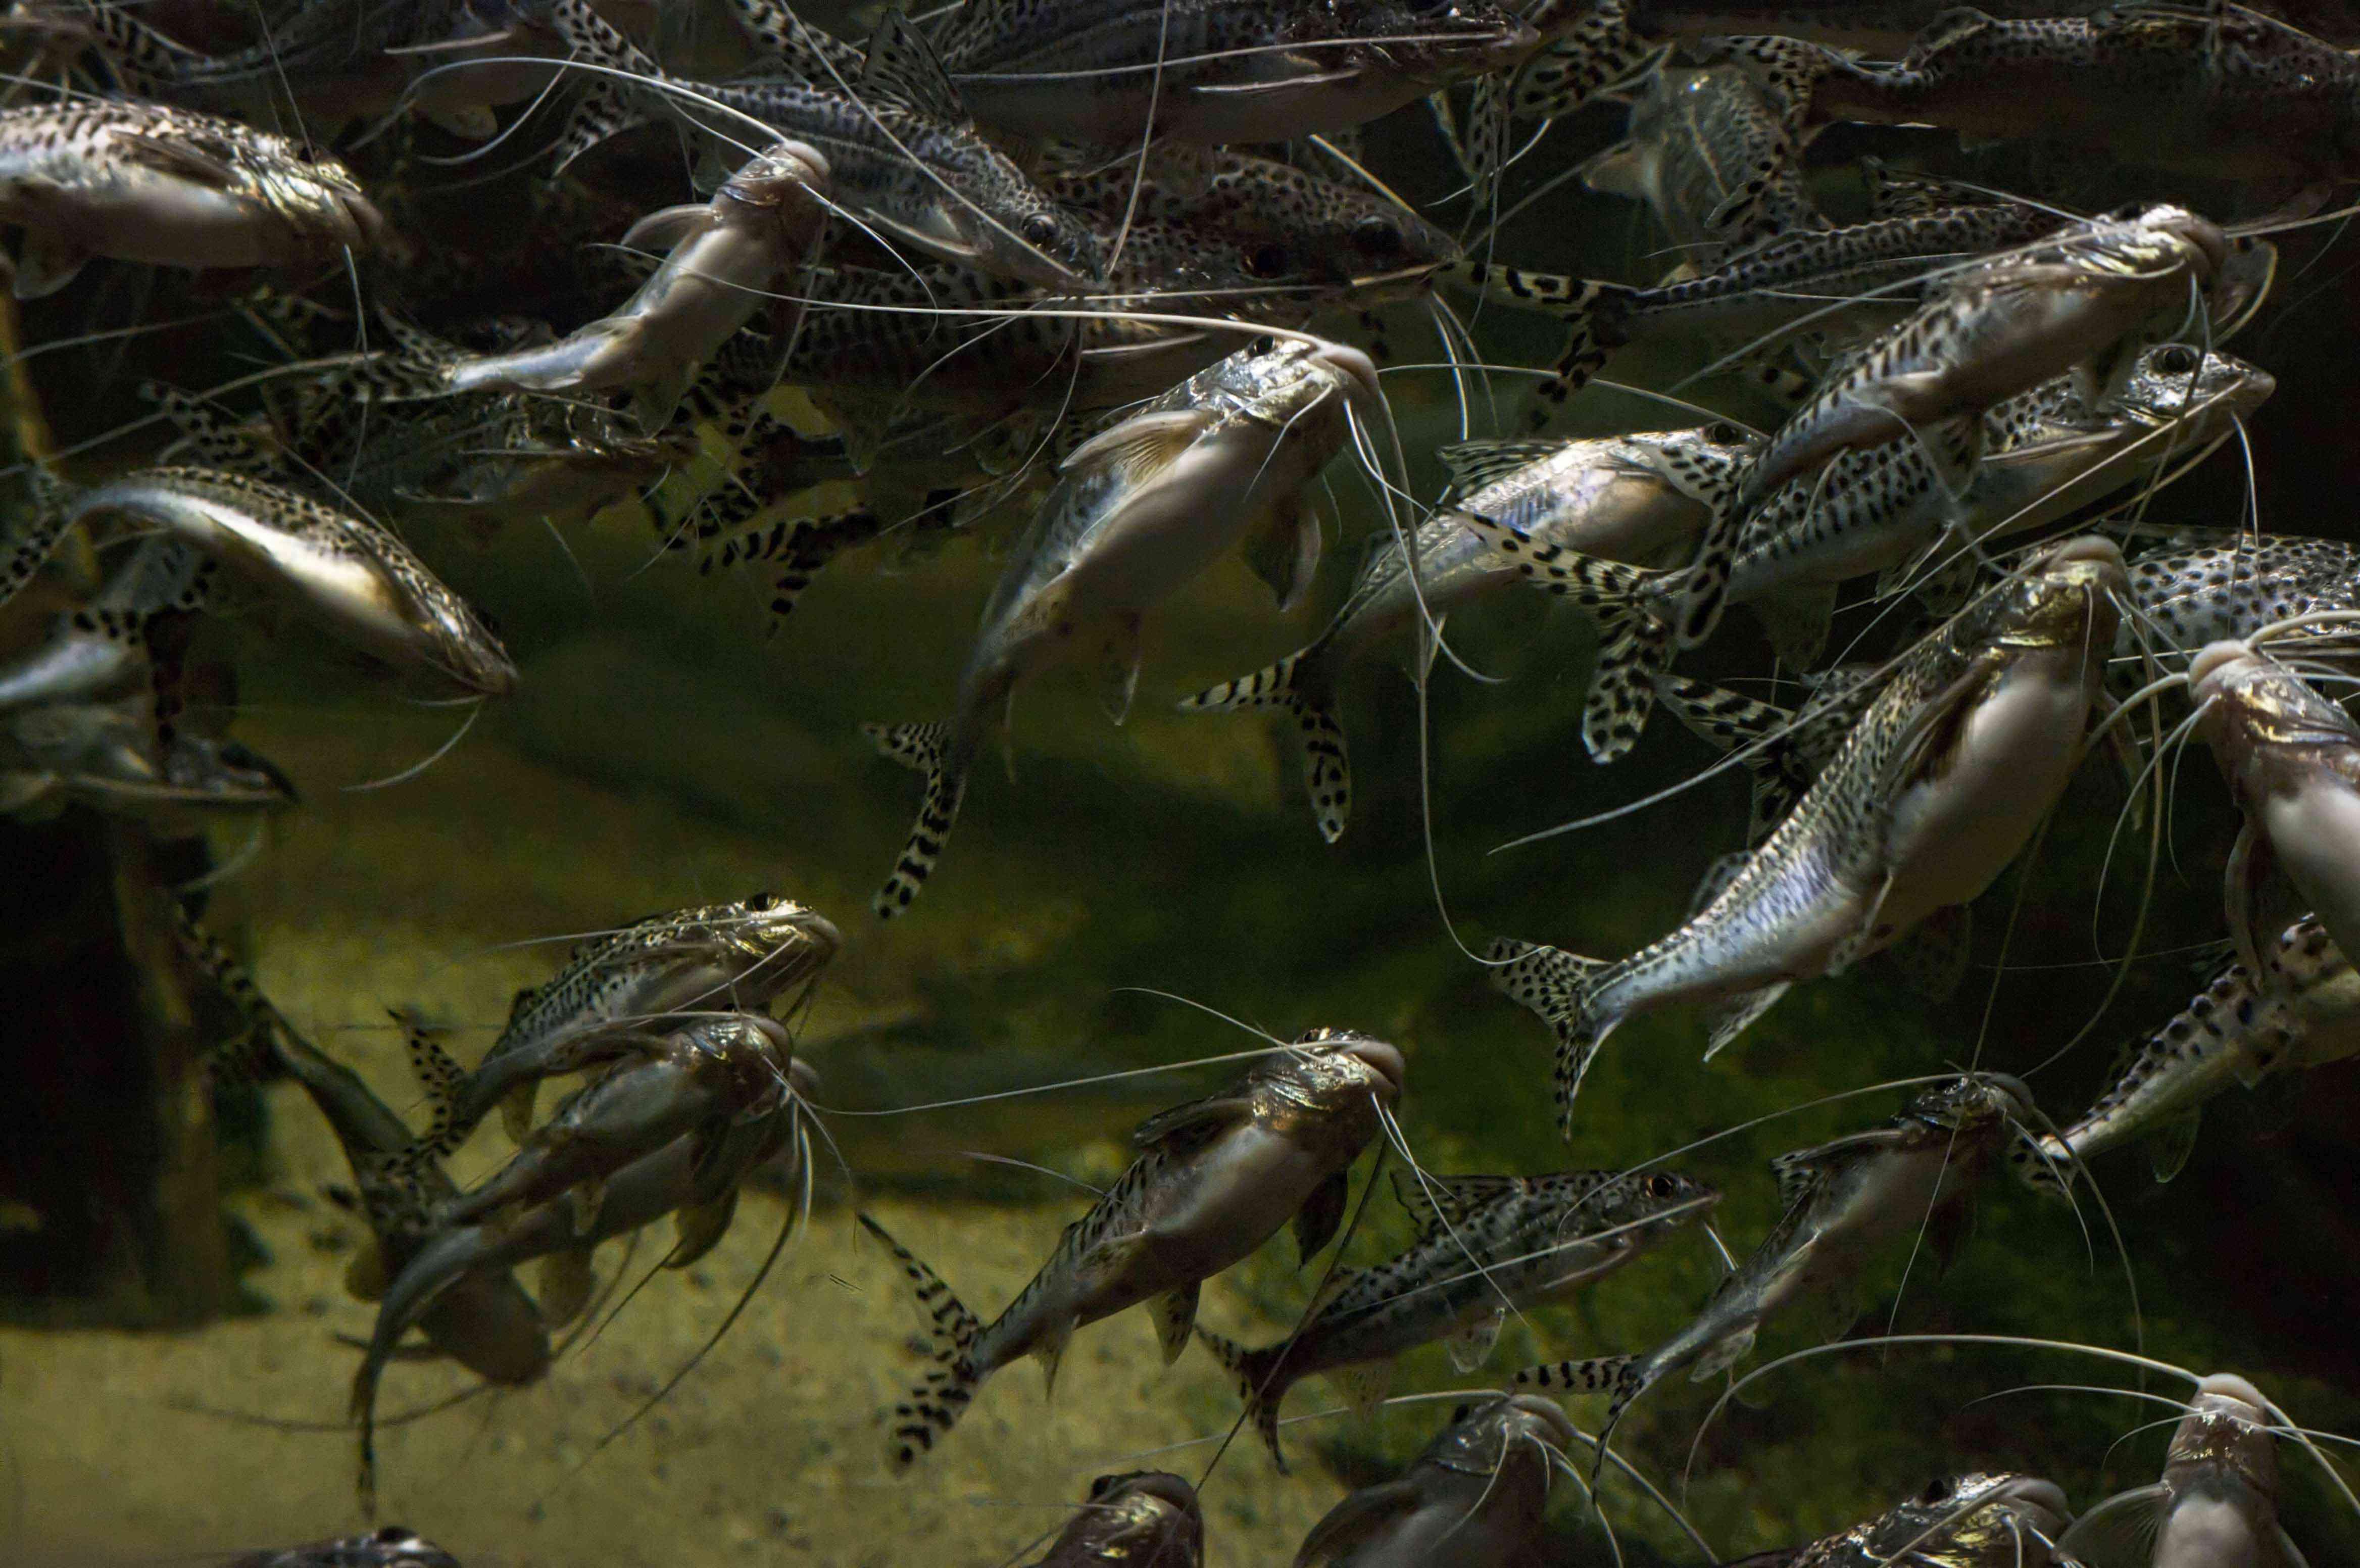 Fish an the Shedd Aquarium